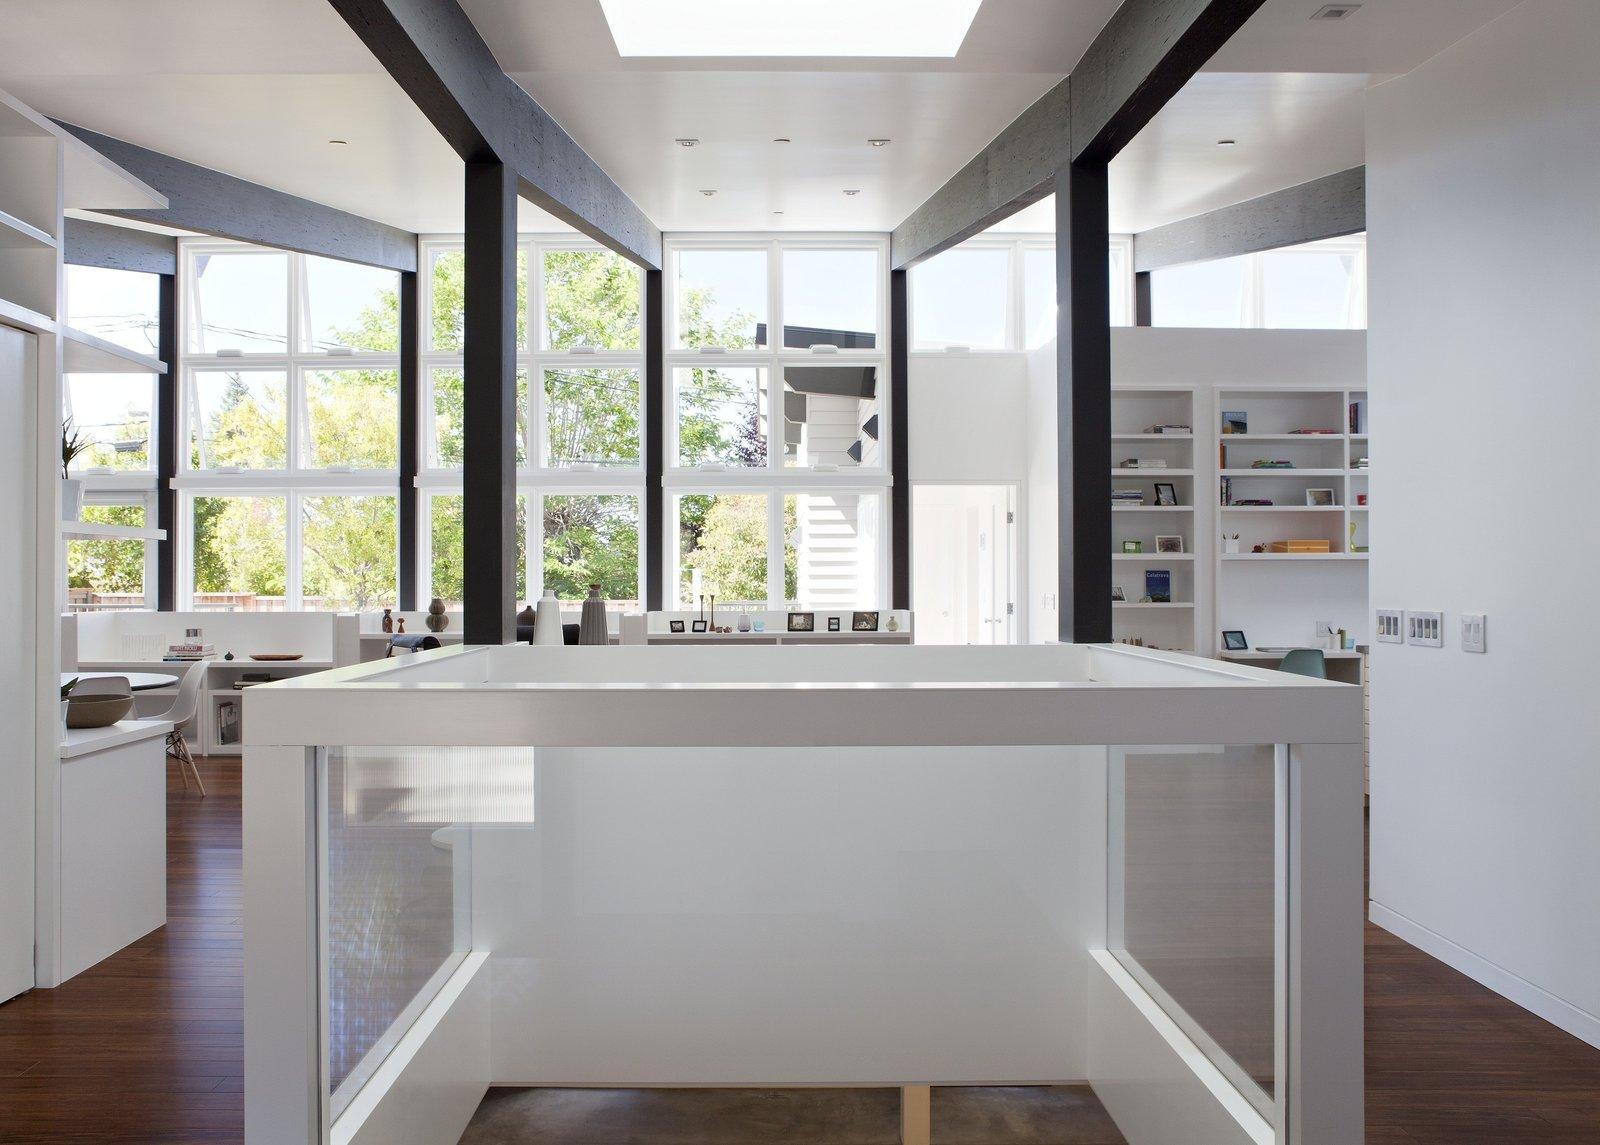 Net Zero Energy Home by Matarozzi Pelsinger Builders